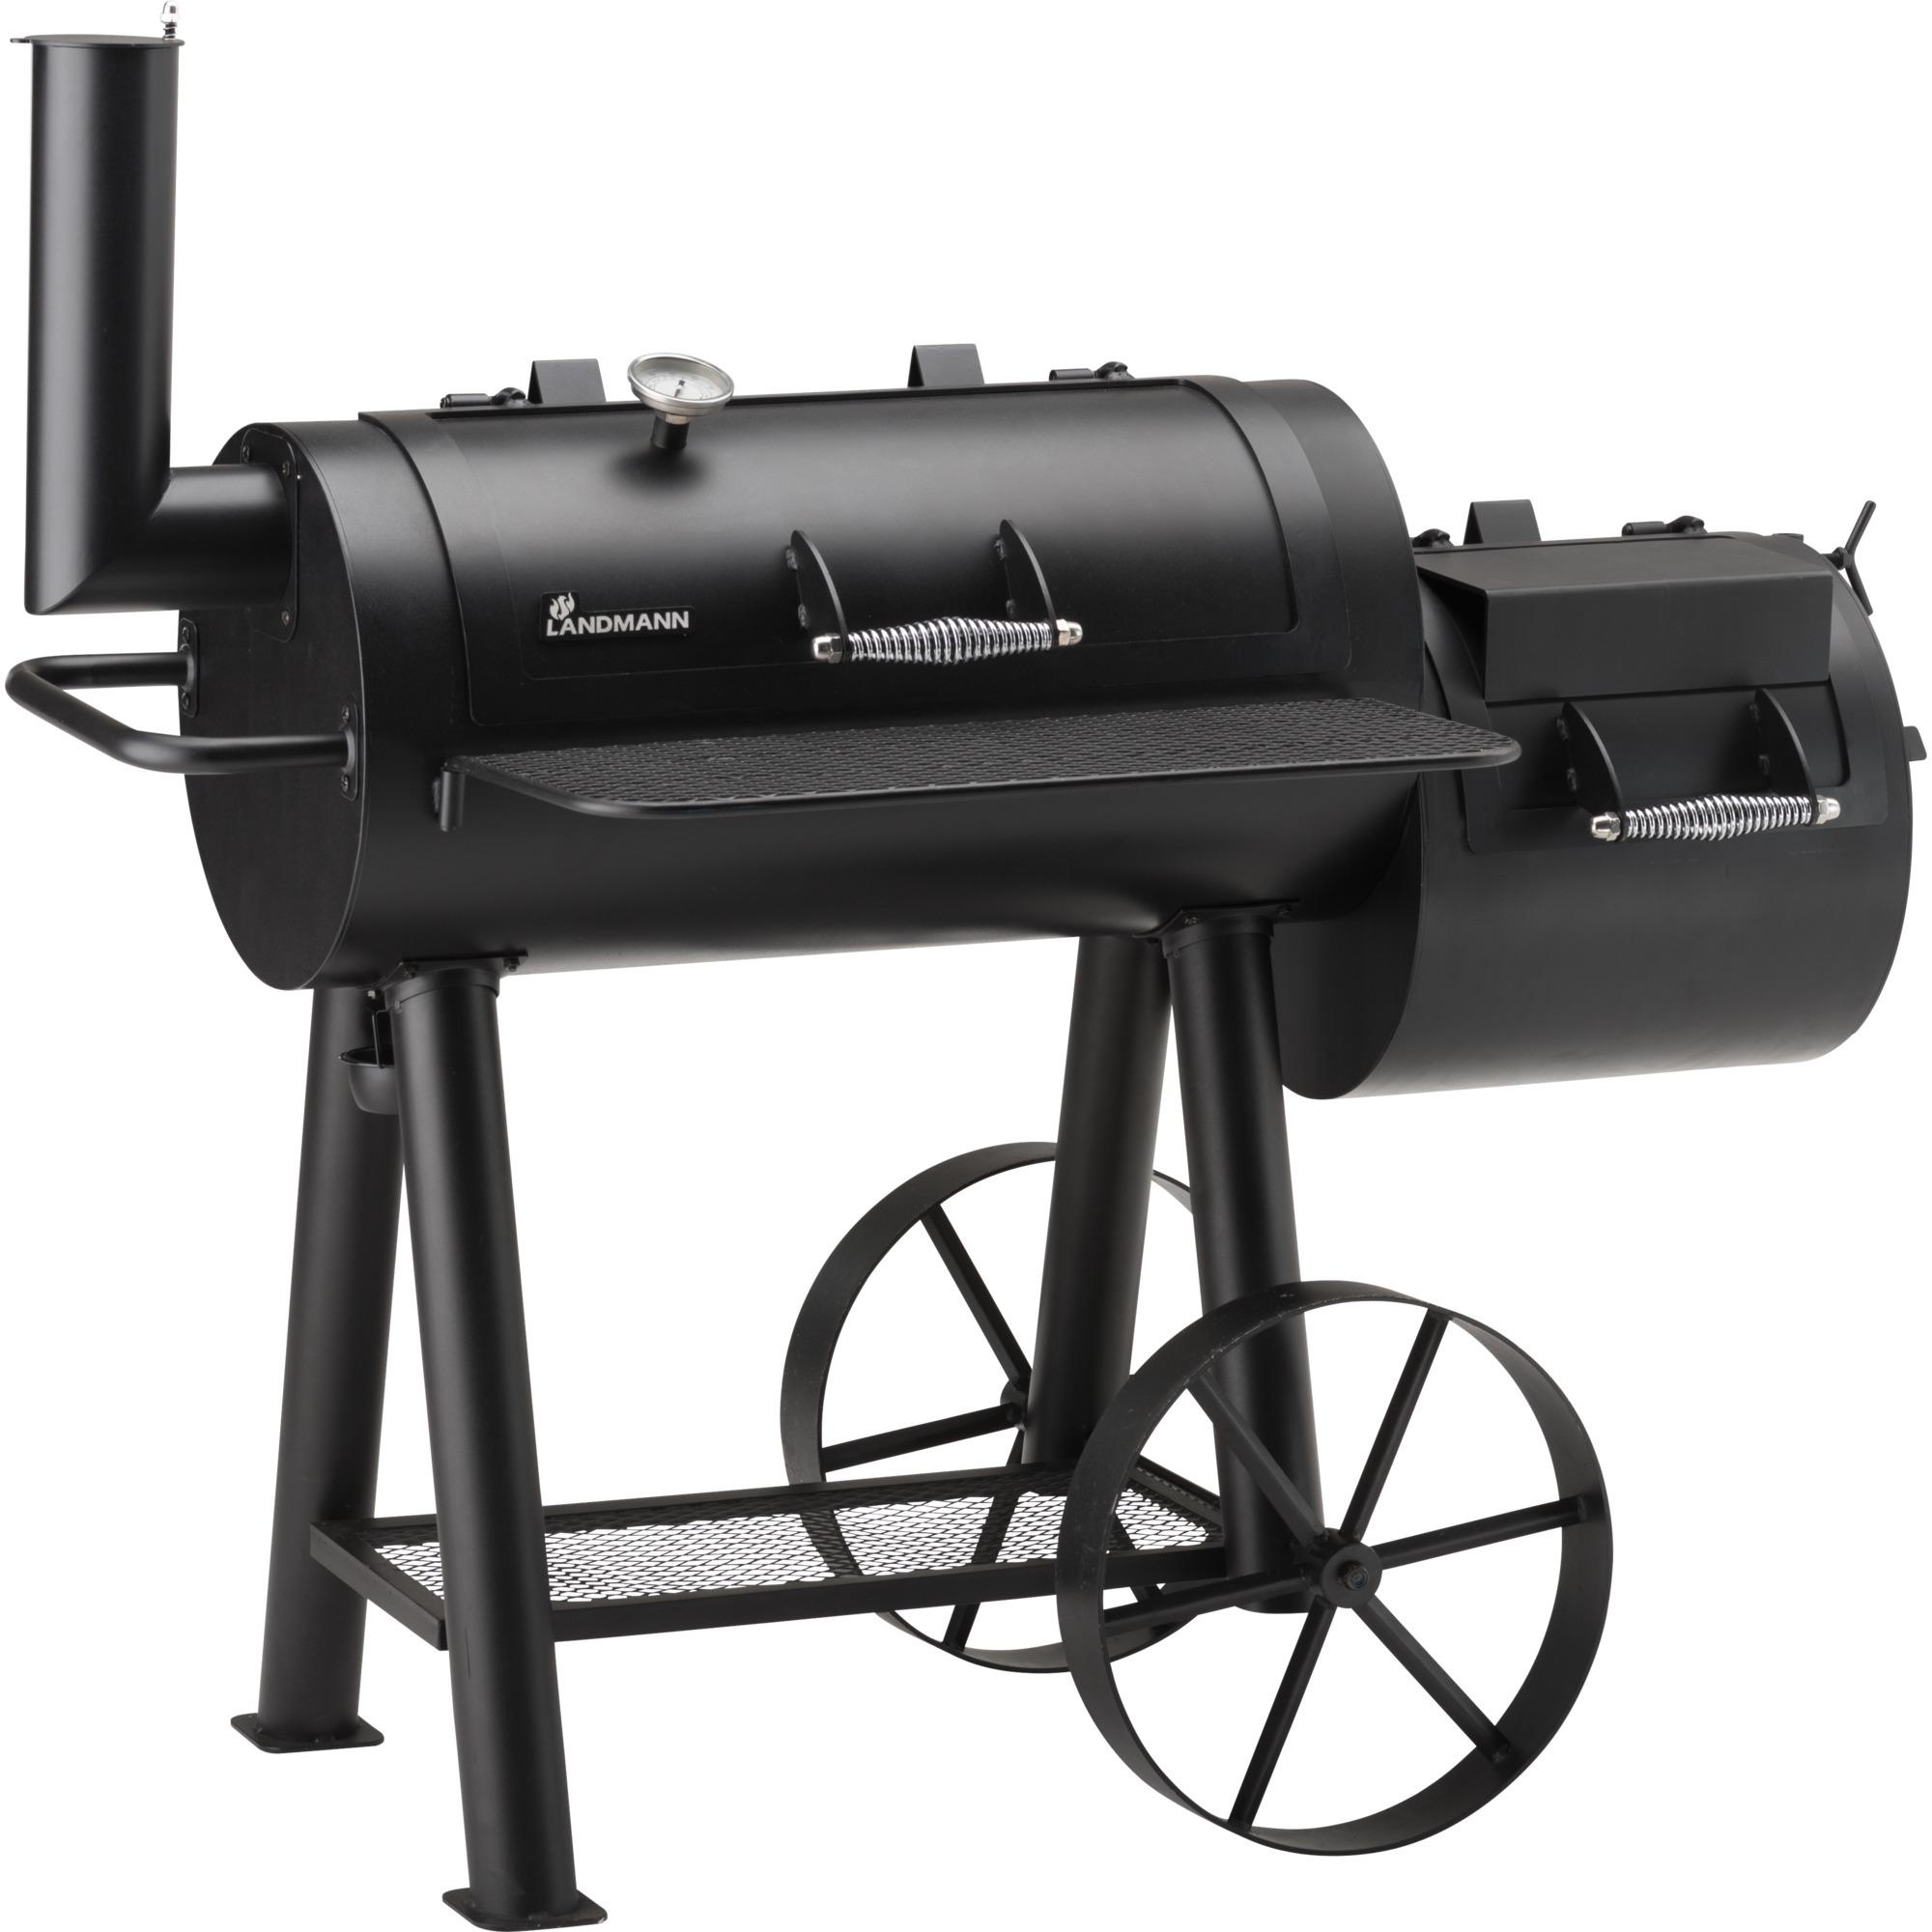 landmann tennessee 400 grill ensemble de cuisson noir, barbecue noir